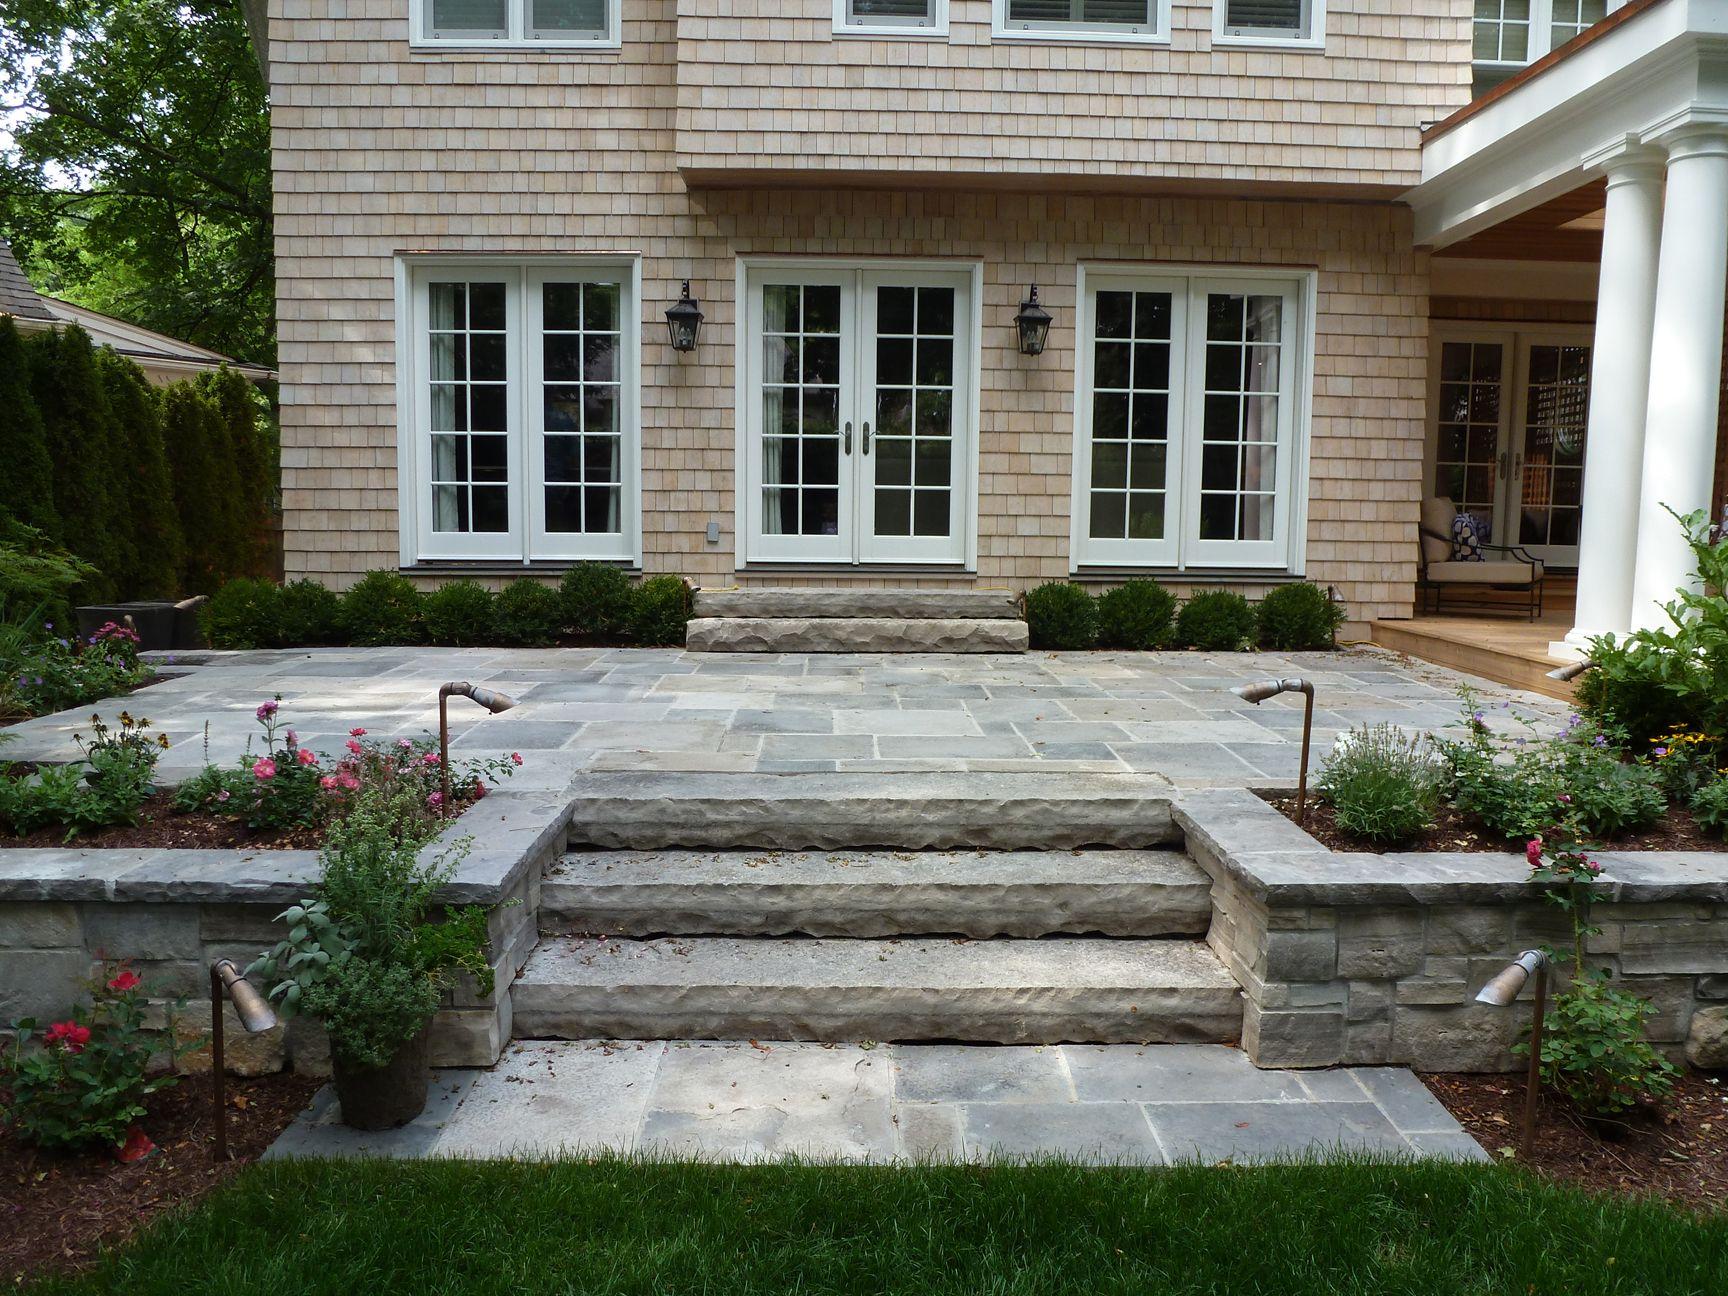 raised stone patios - Google Search … | Stone patio ... on Raised Concrete Patio Ideas id=61264